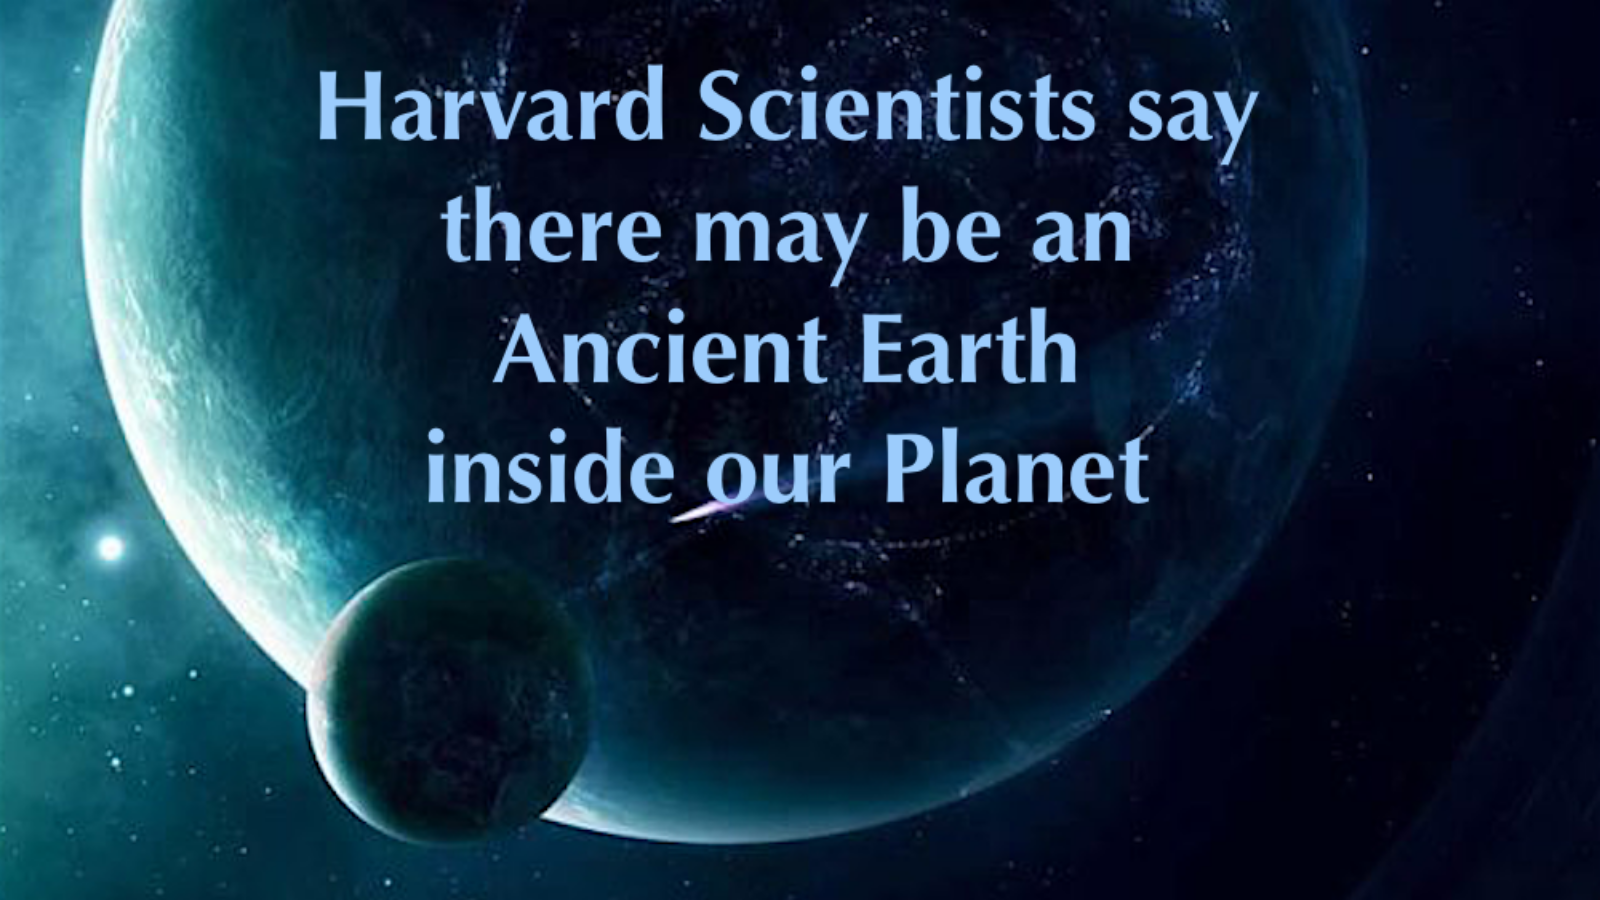 harvardscientists